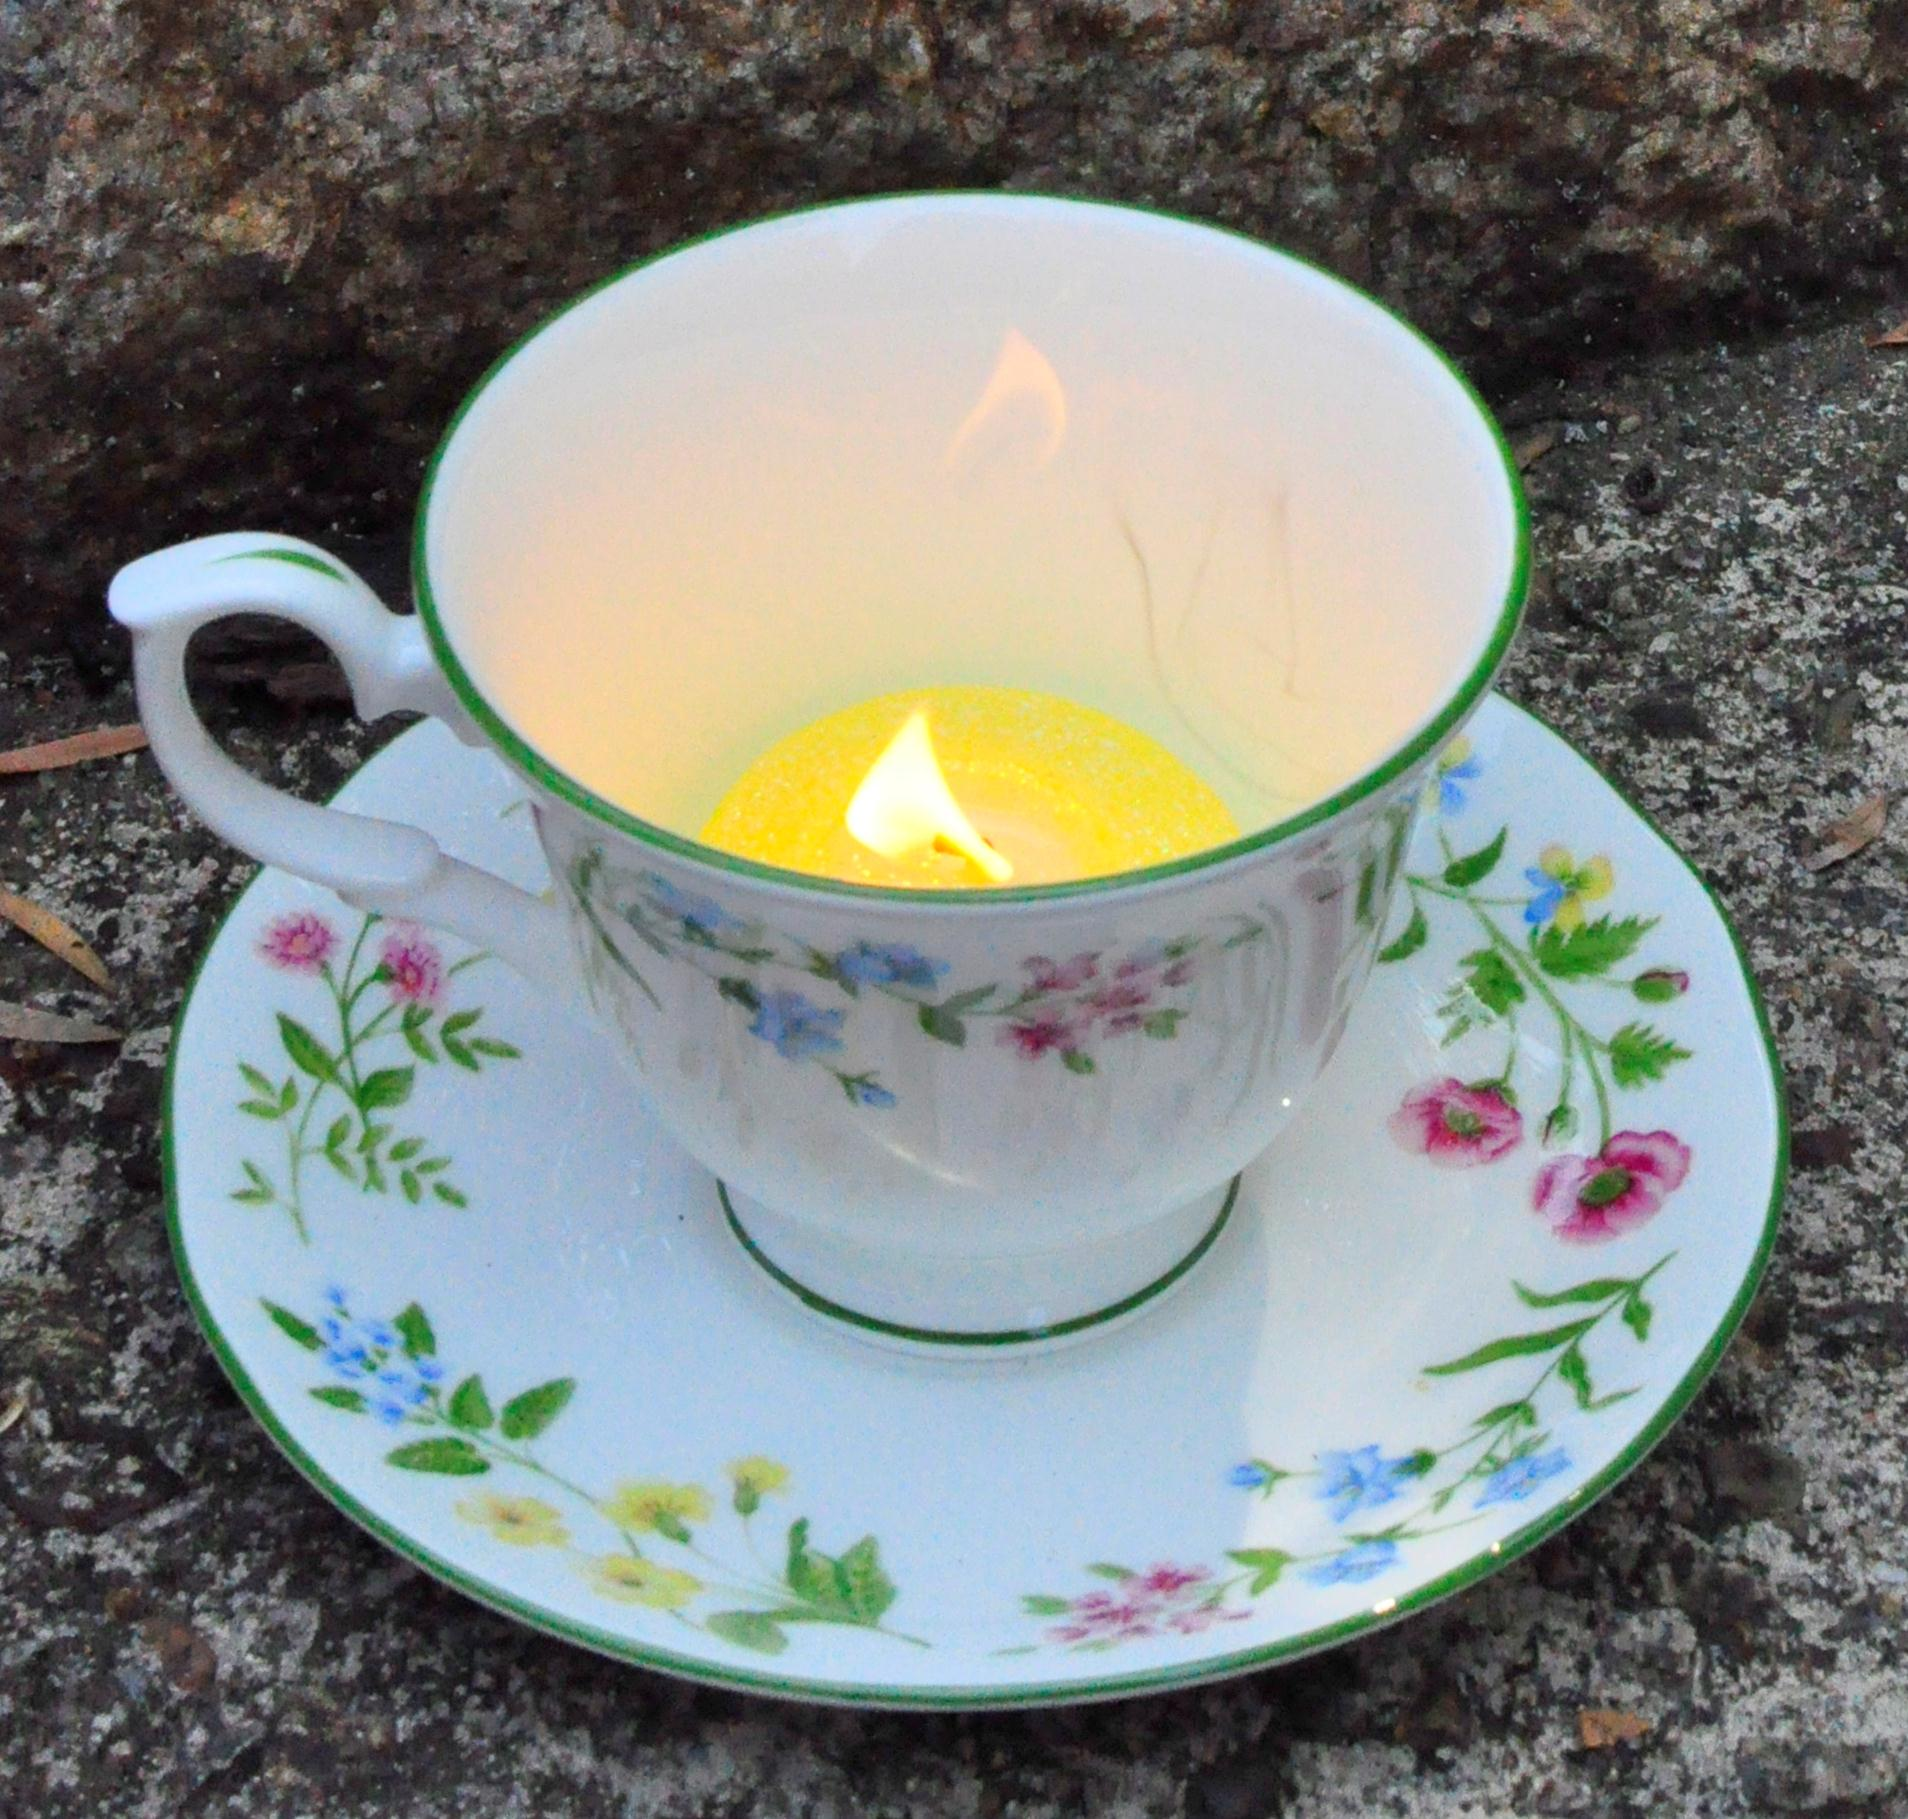 ways to use a tea cup tea light candle dinner table centrepiece place ...